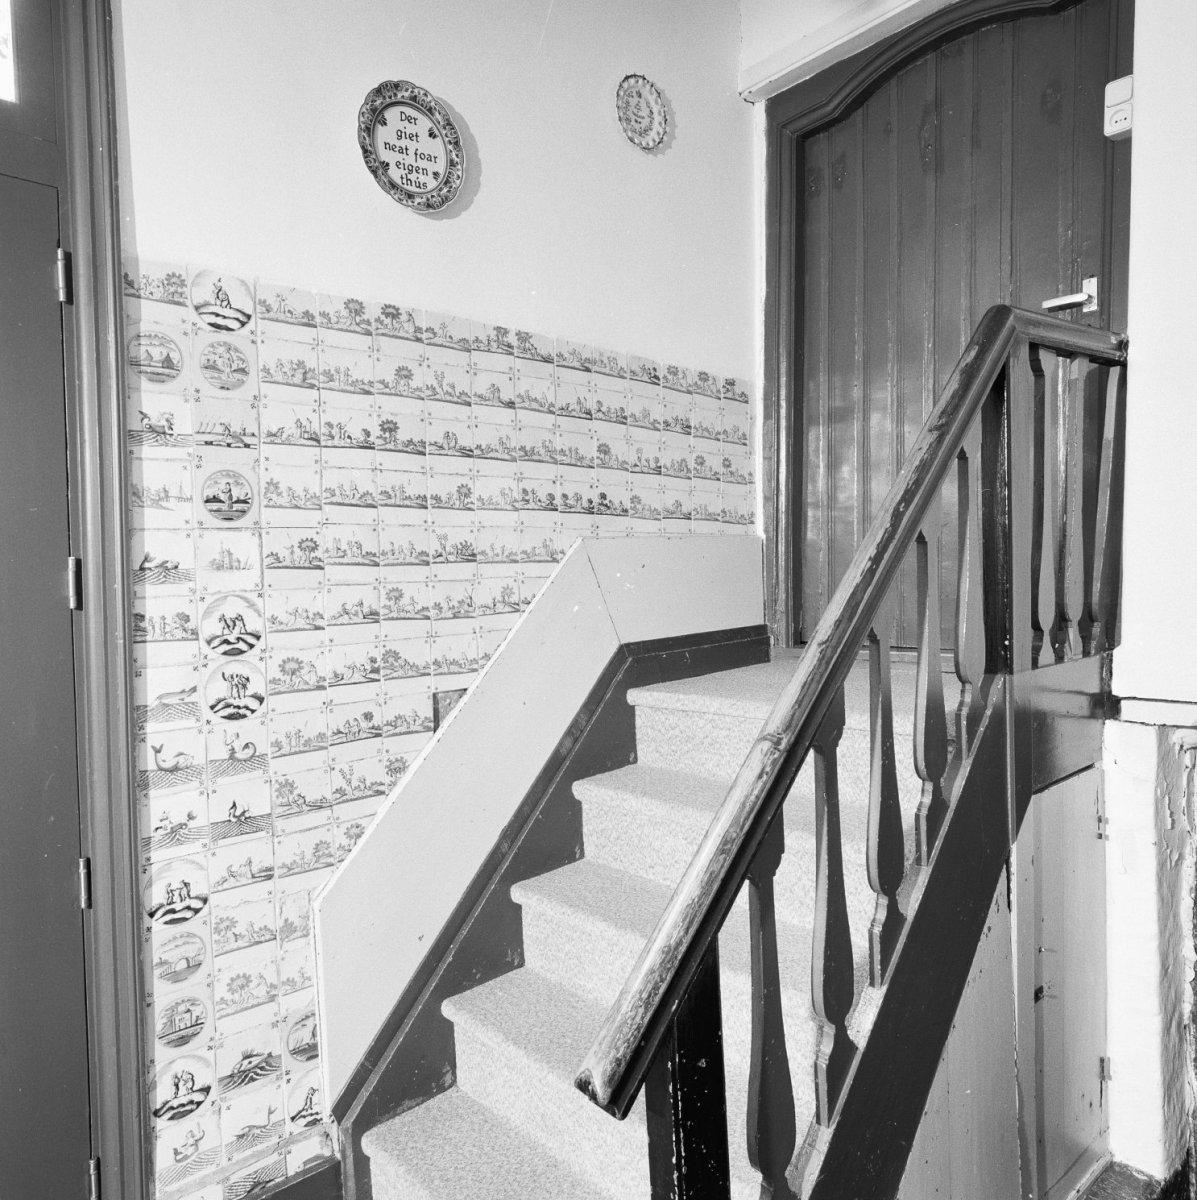 File interieur overzicht hal met beschilderde tegels en trap 20000566 wikimedia - Model interieur trap ...